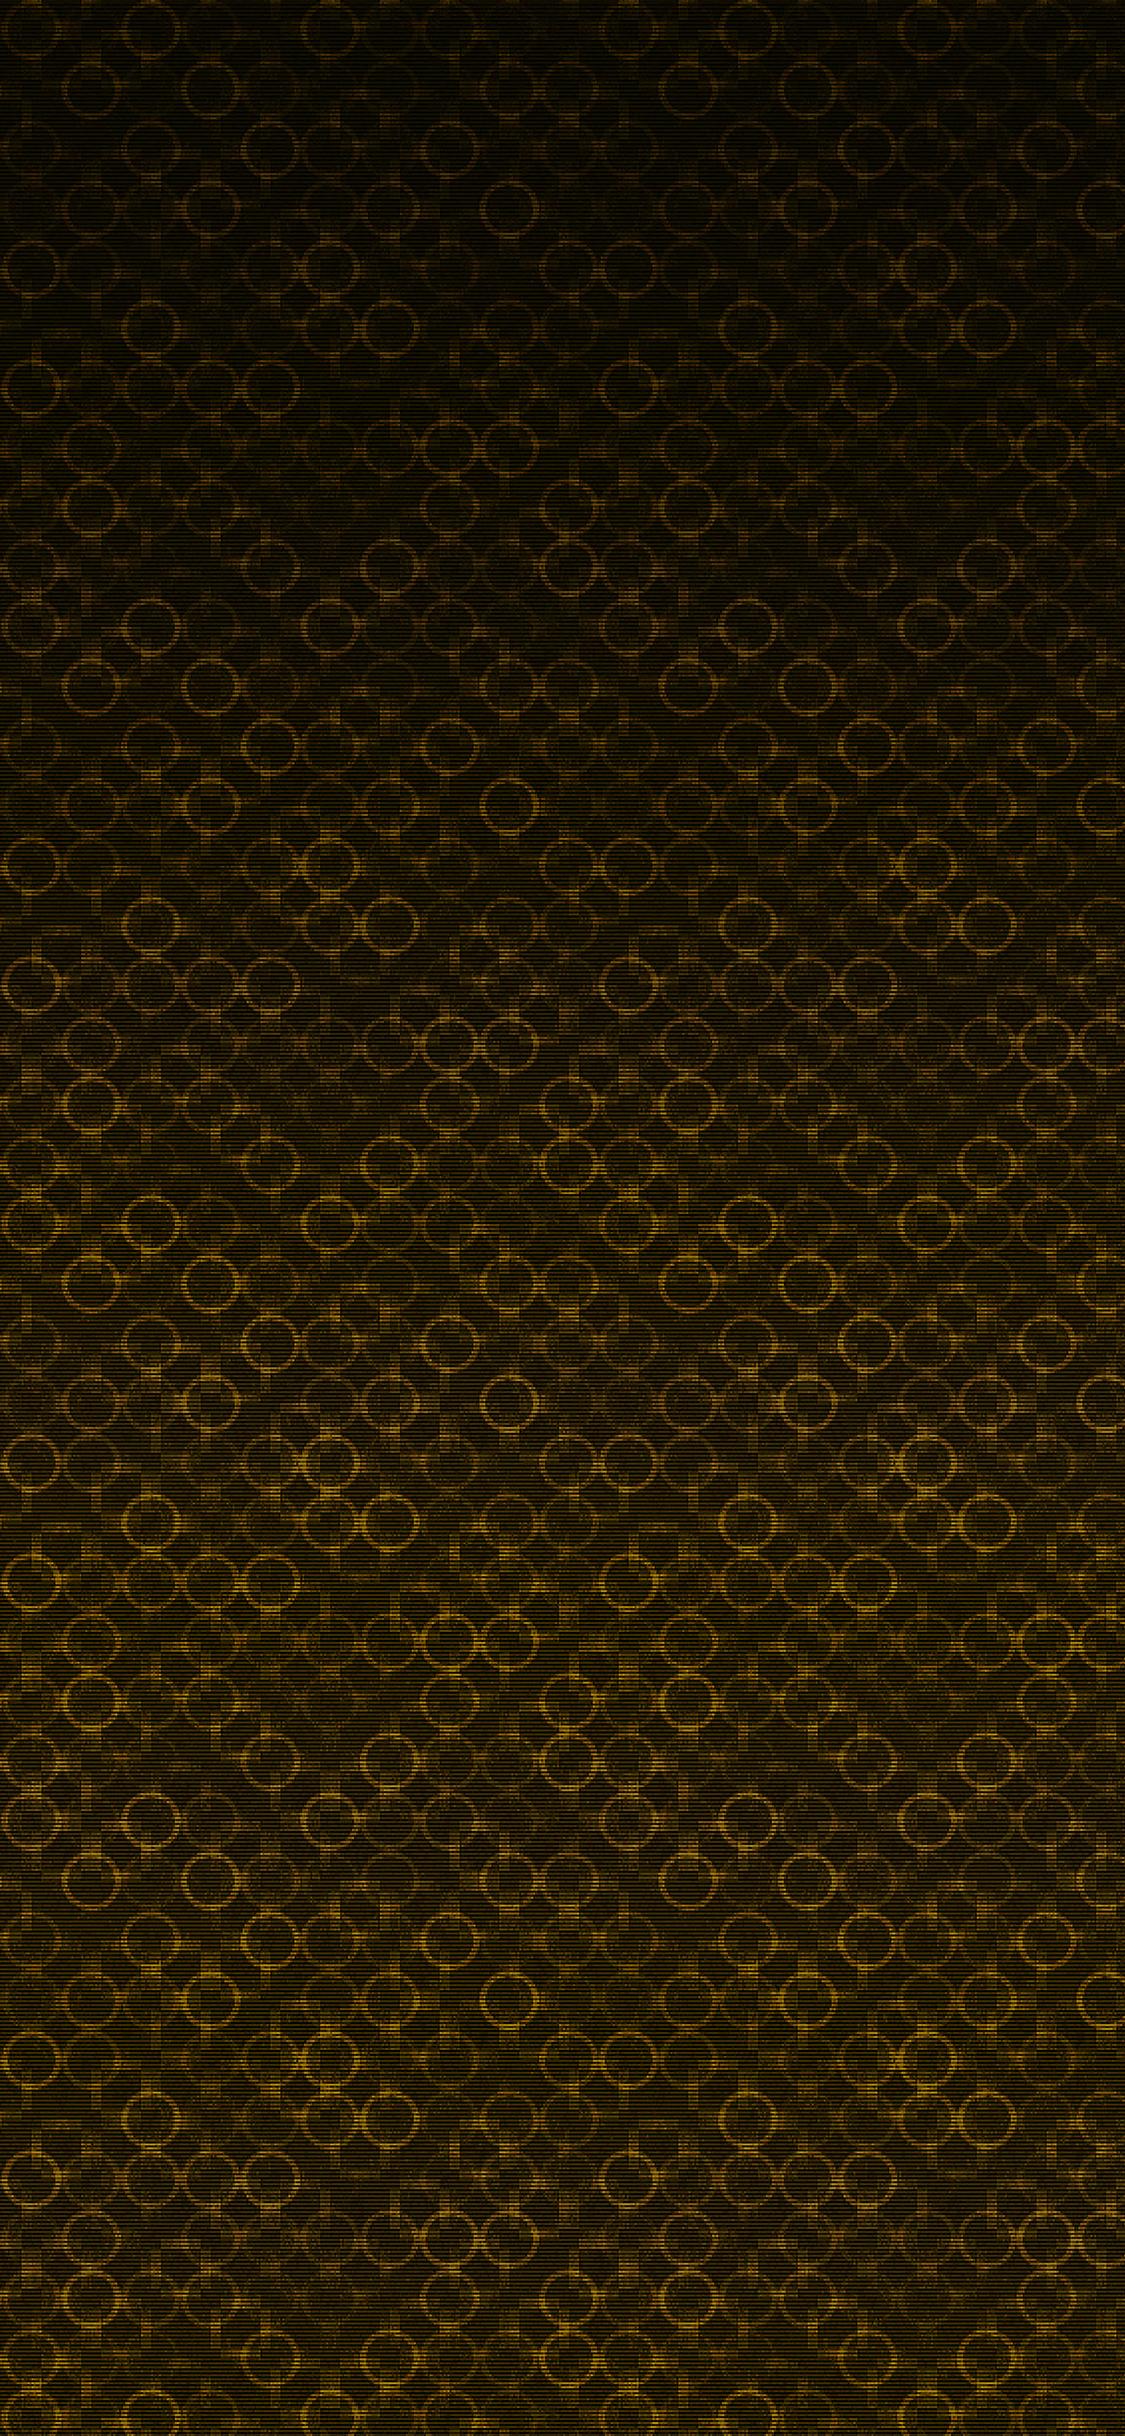 iPhoneXpapers.com-Apple-iPhone-wallpaper-vc69-strange-bulls-eye-pattern